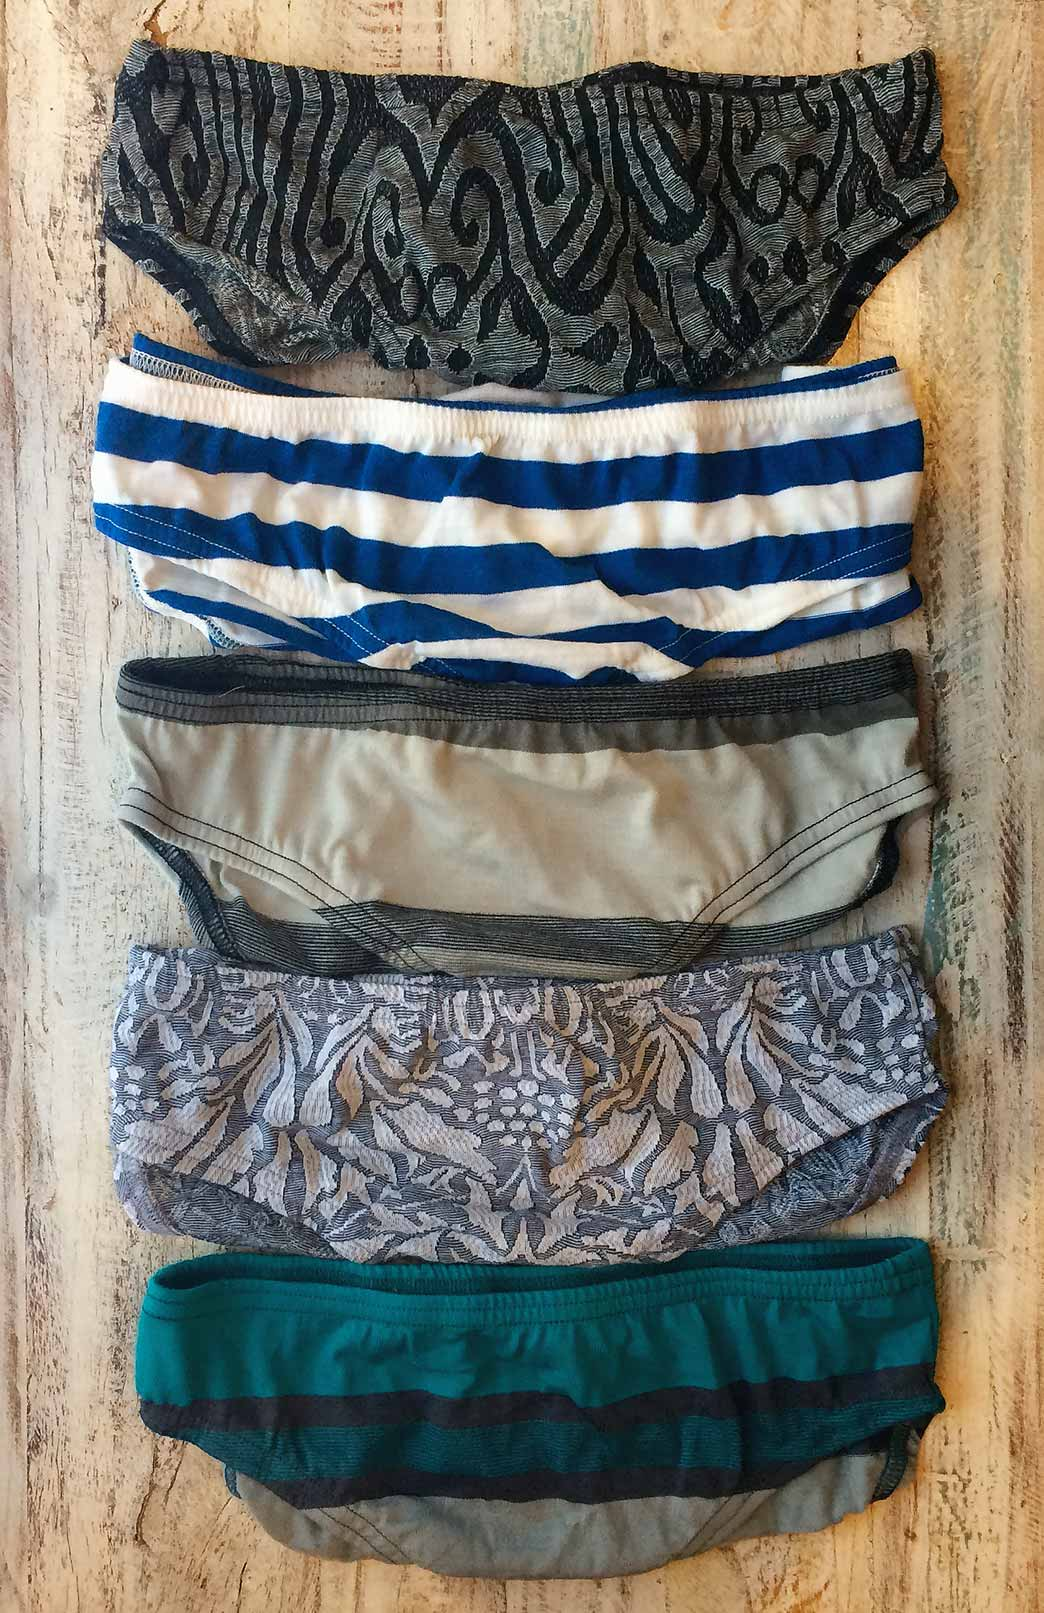 Smitten Knickers (Pack of Three) - Women's Superfine Merino Wool Underwear - Smitten Merino Tasmania Australia